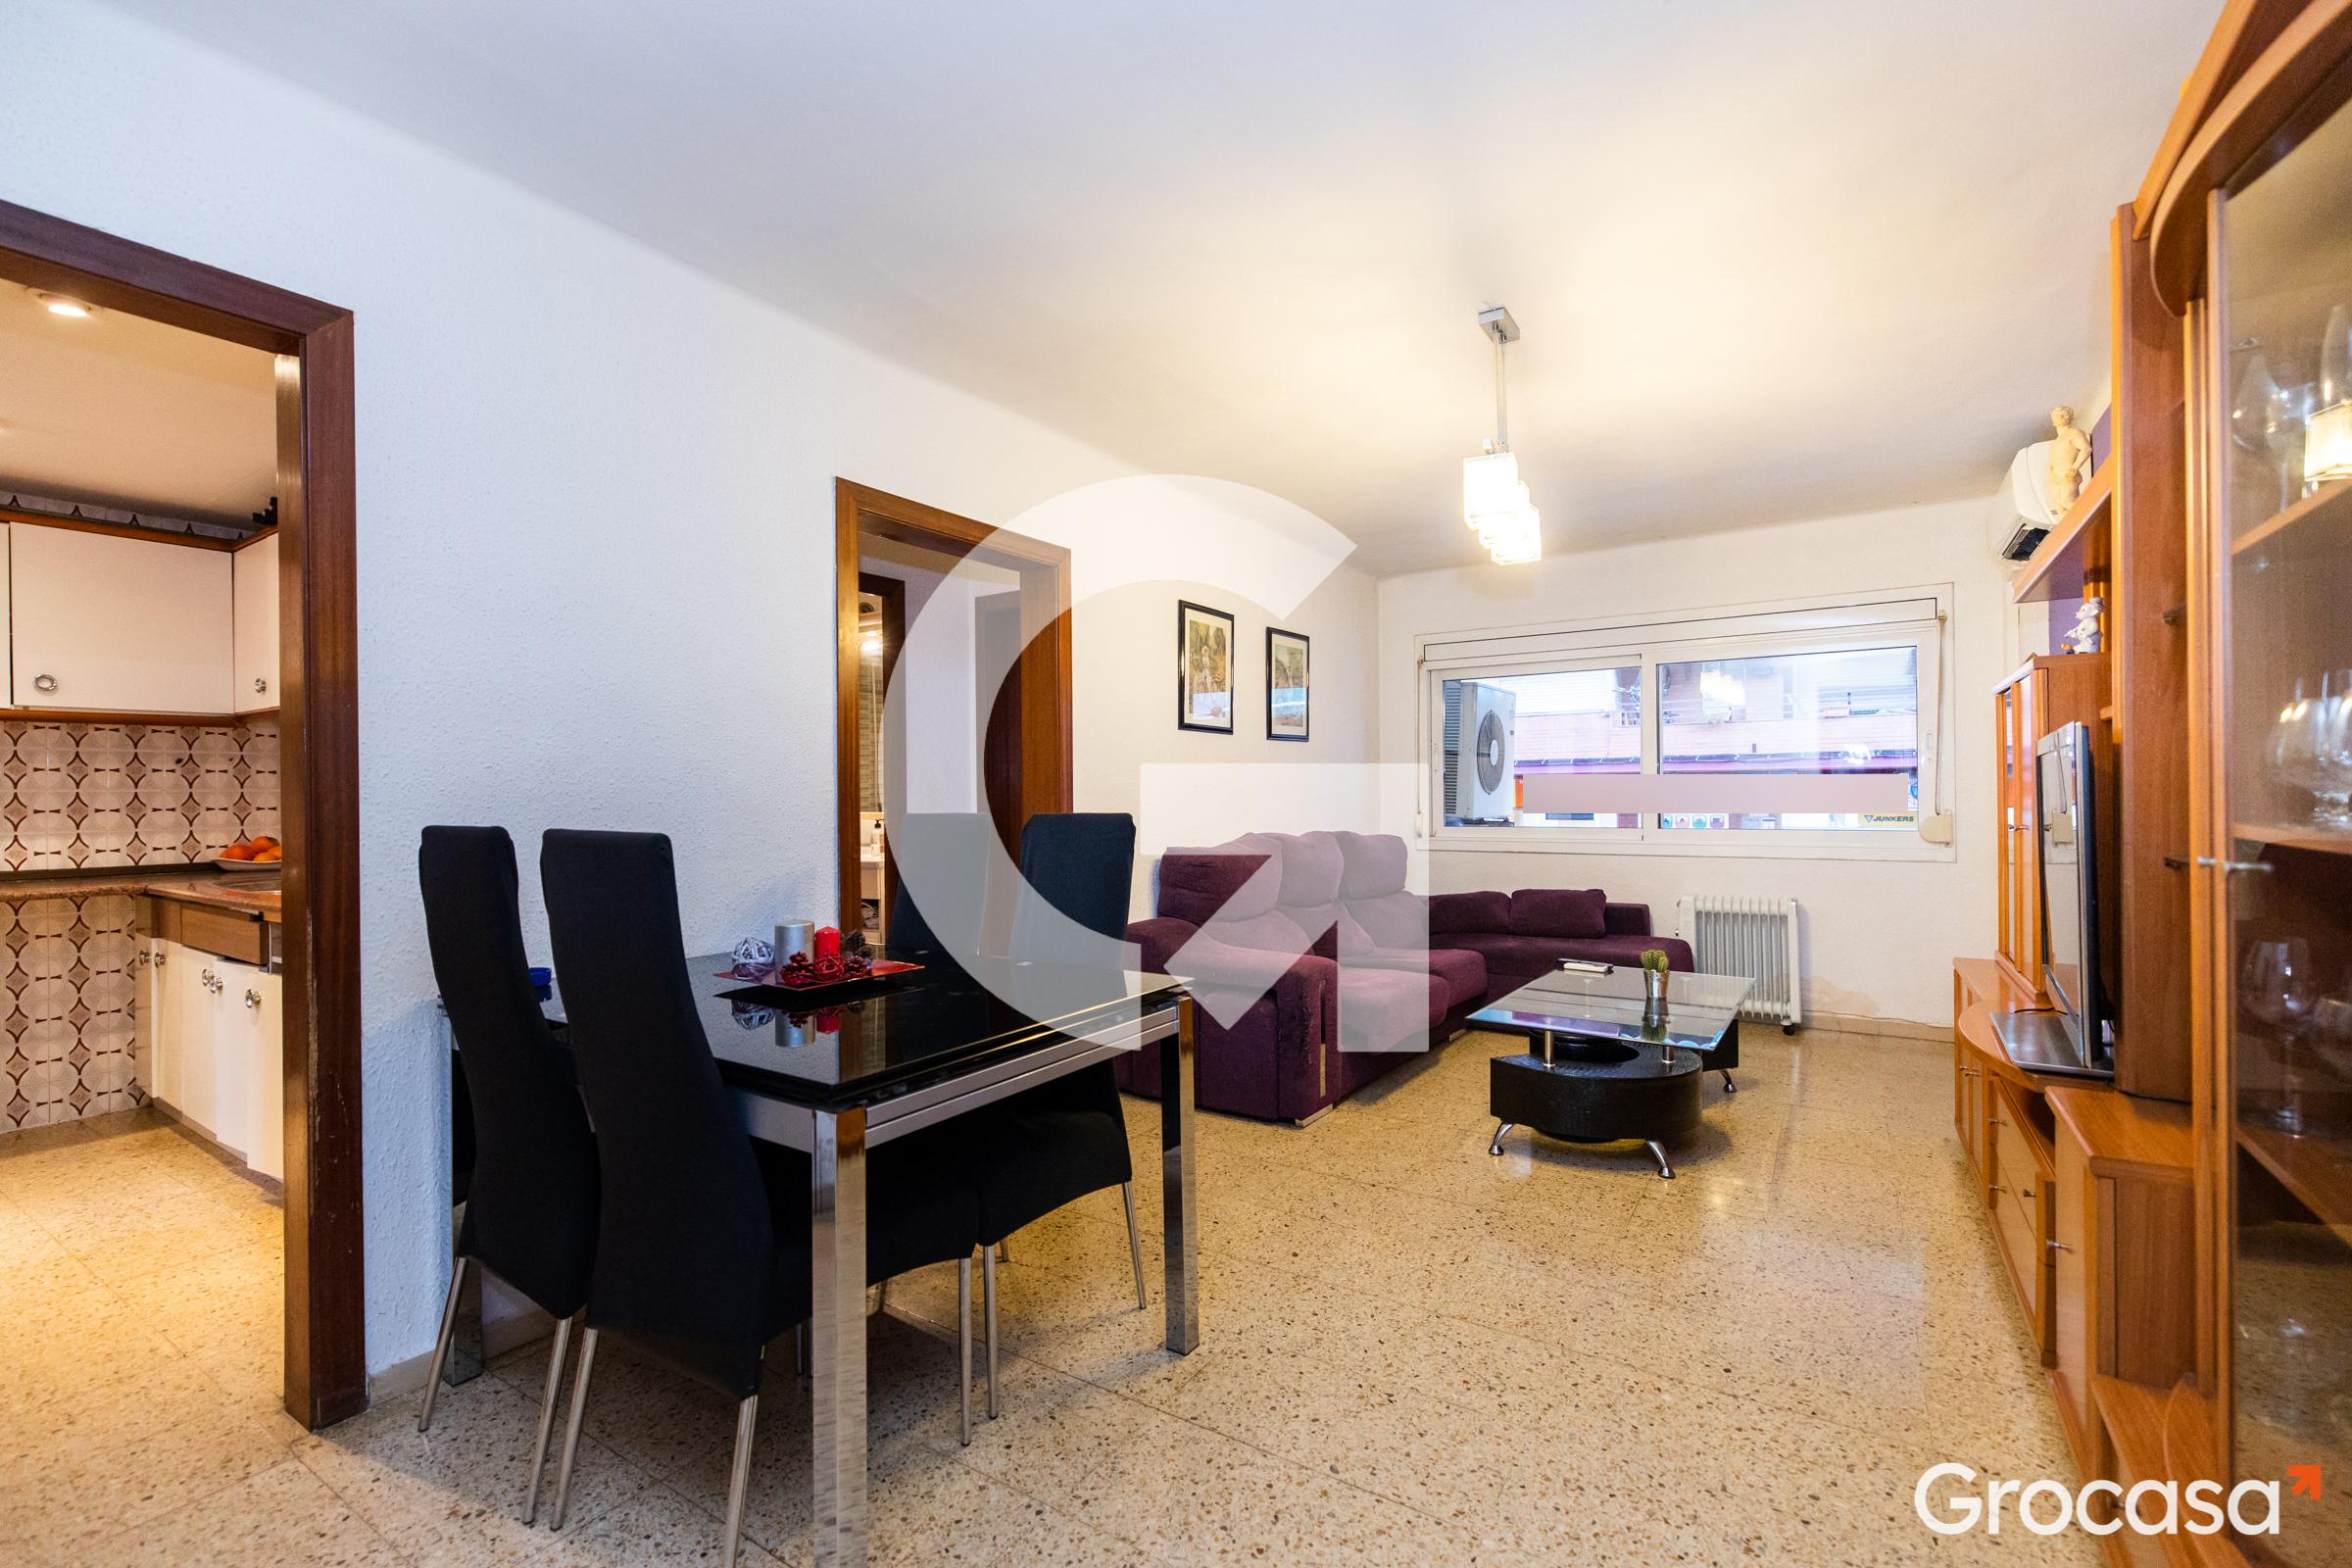 Piso en Vinyets moli vell en Sant Boi de Llobregat en Venta por 165.000€